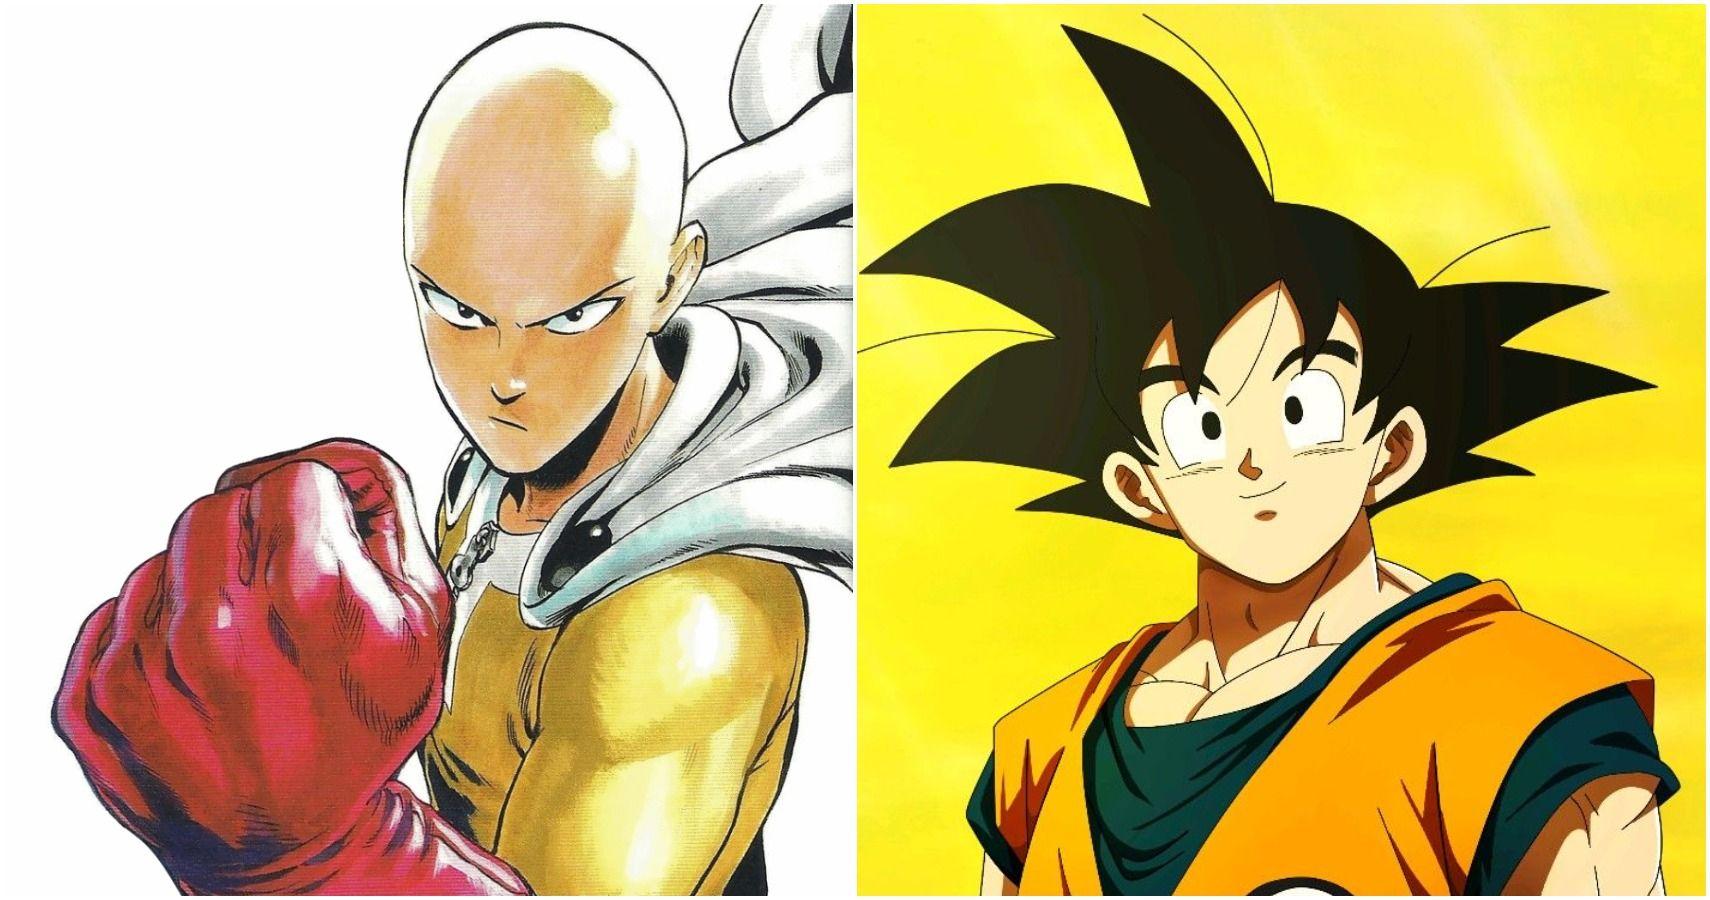 Saitama Images - Is Saitama Stronger Than Goku? 5 Reasons Each Character ...